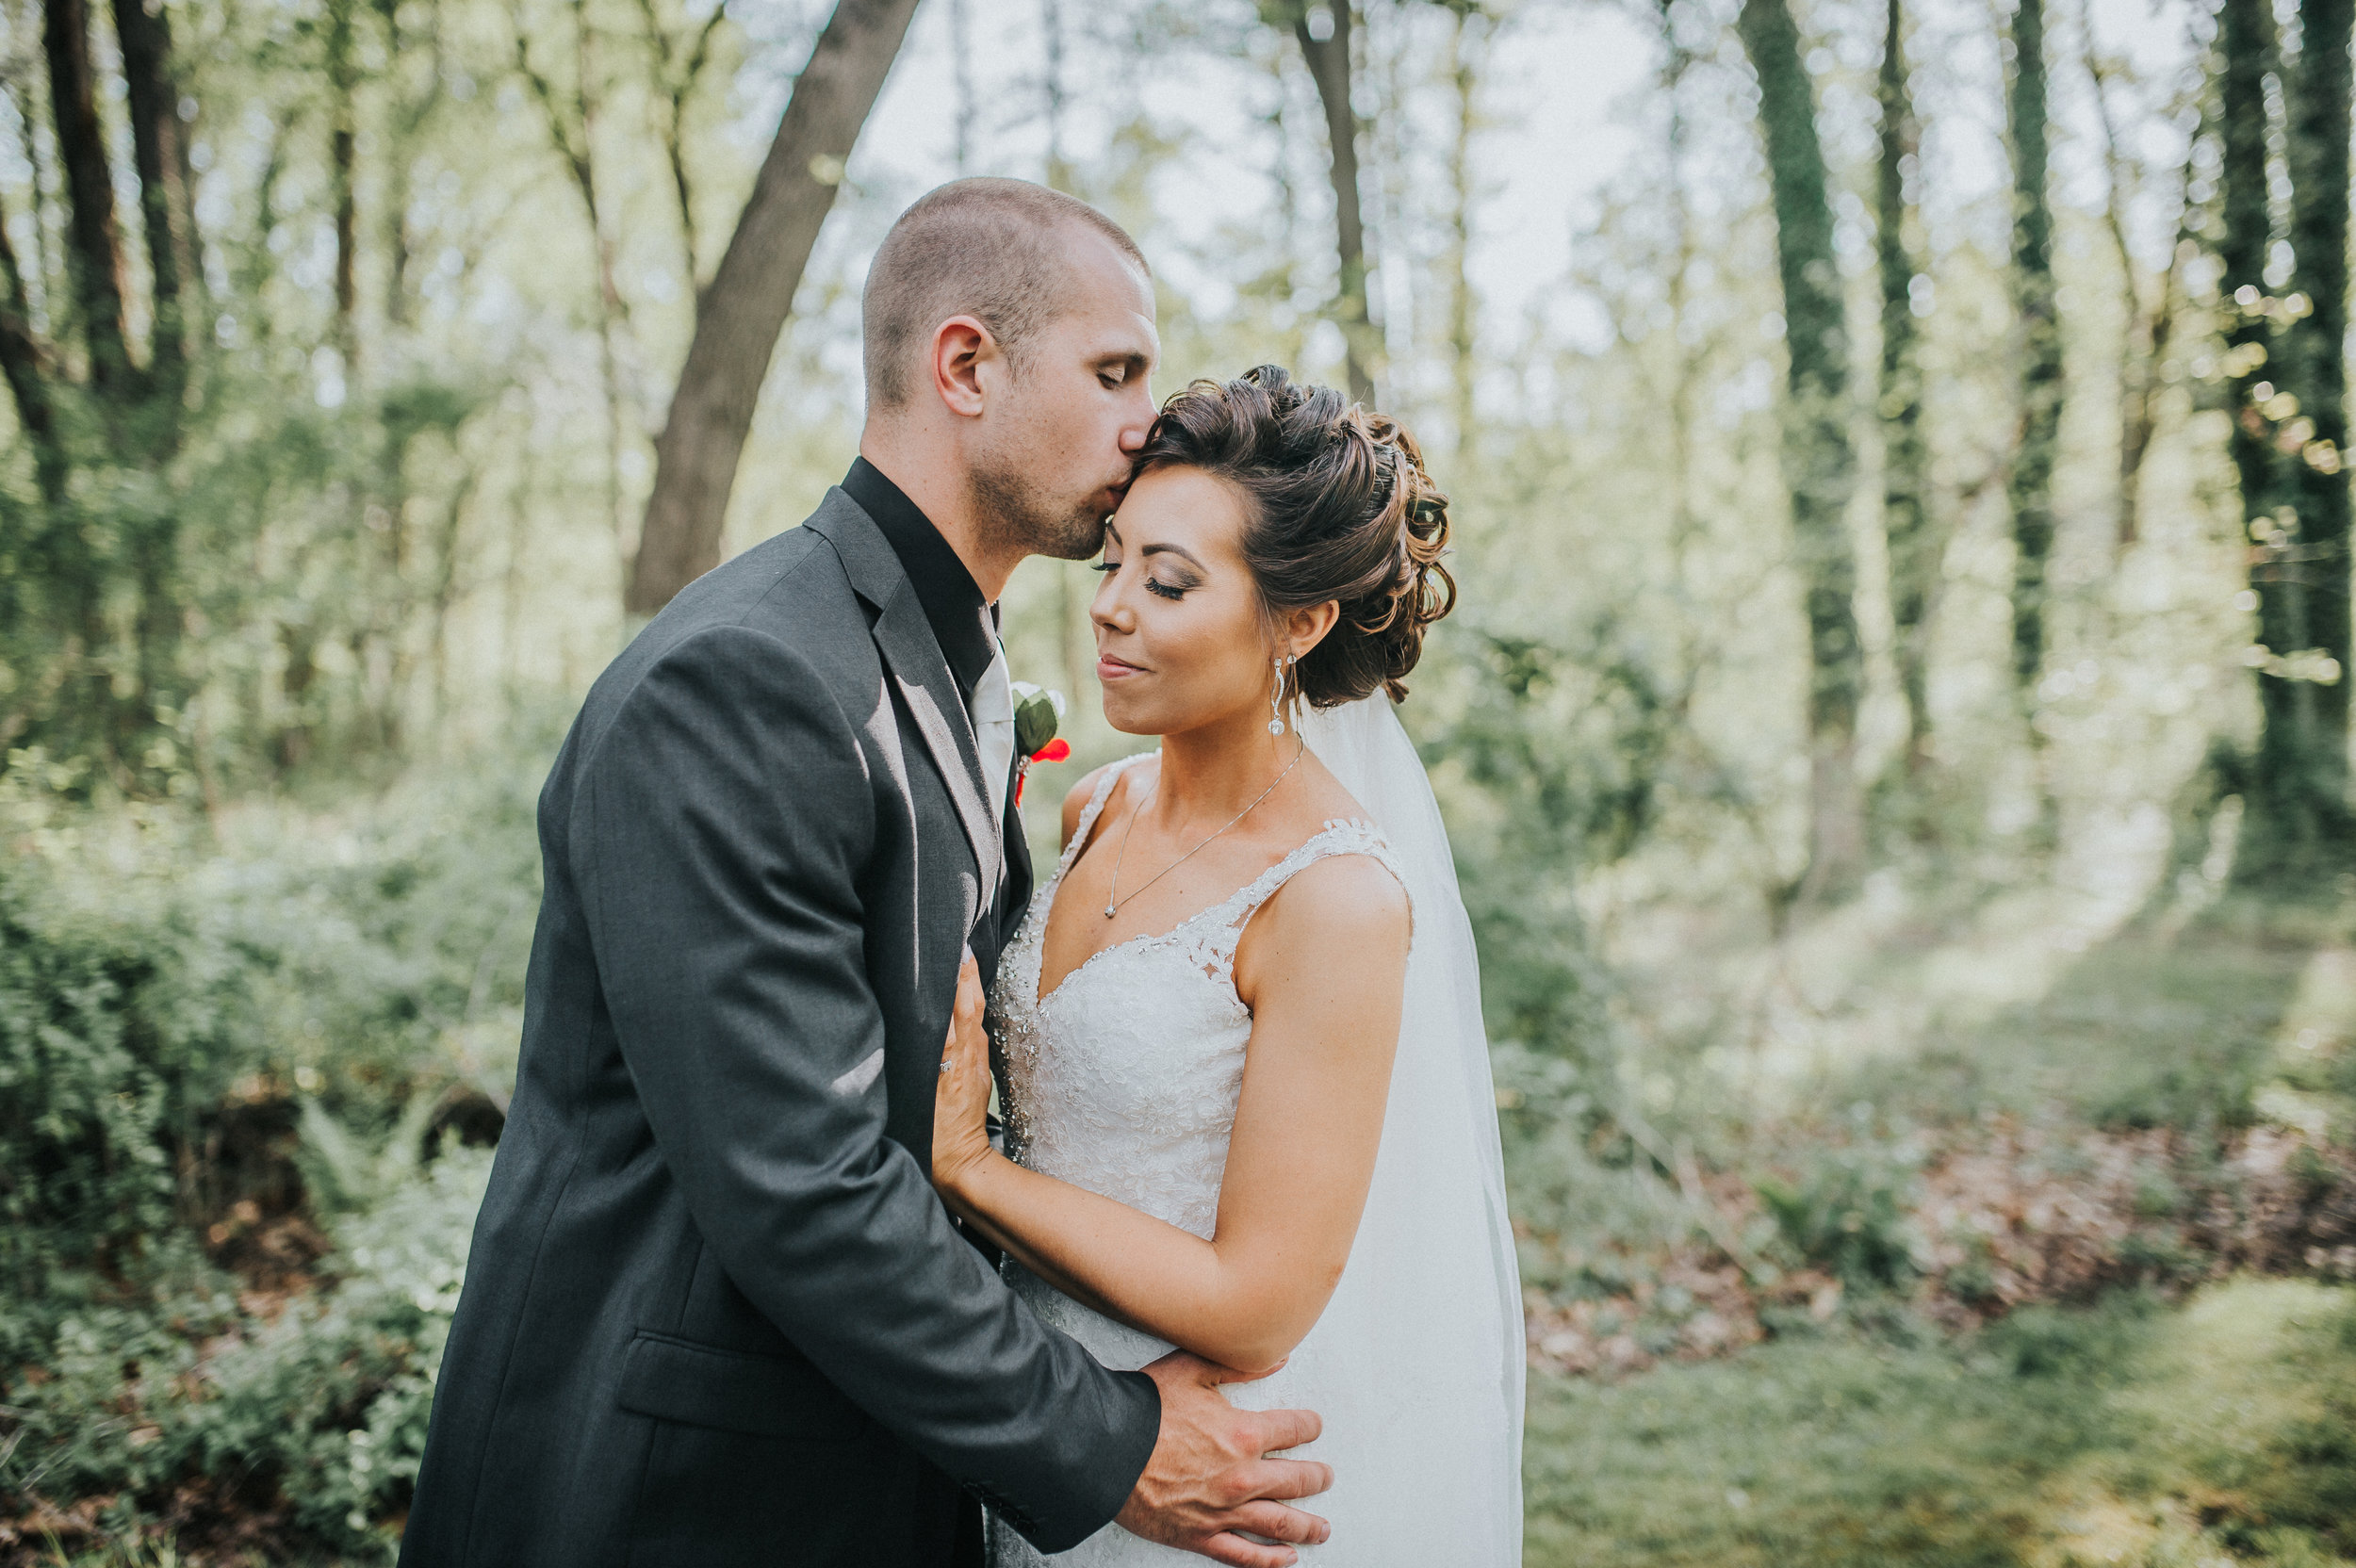 Christina-and-Gene-Wedding-Marla-Rain-Photography-258.jpg